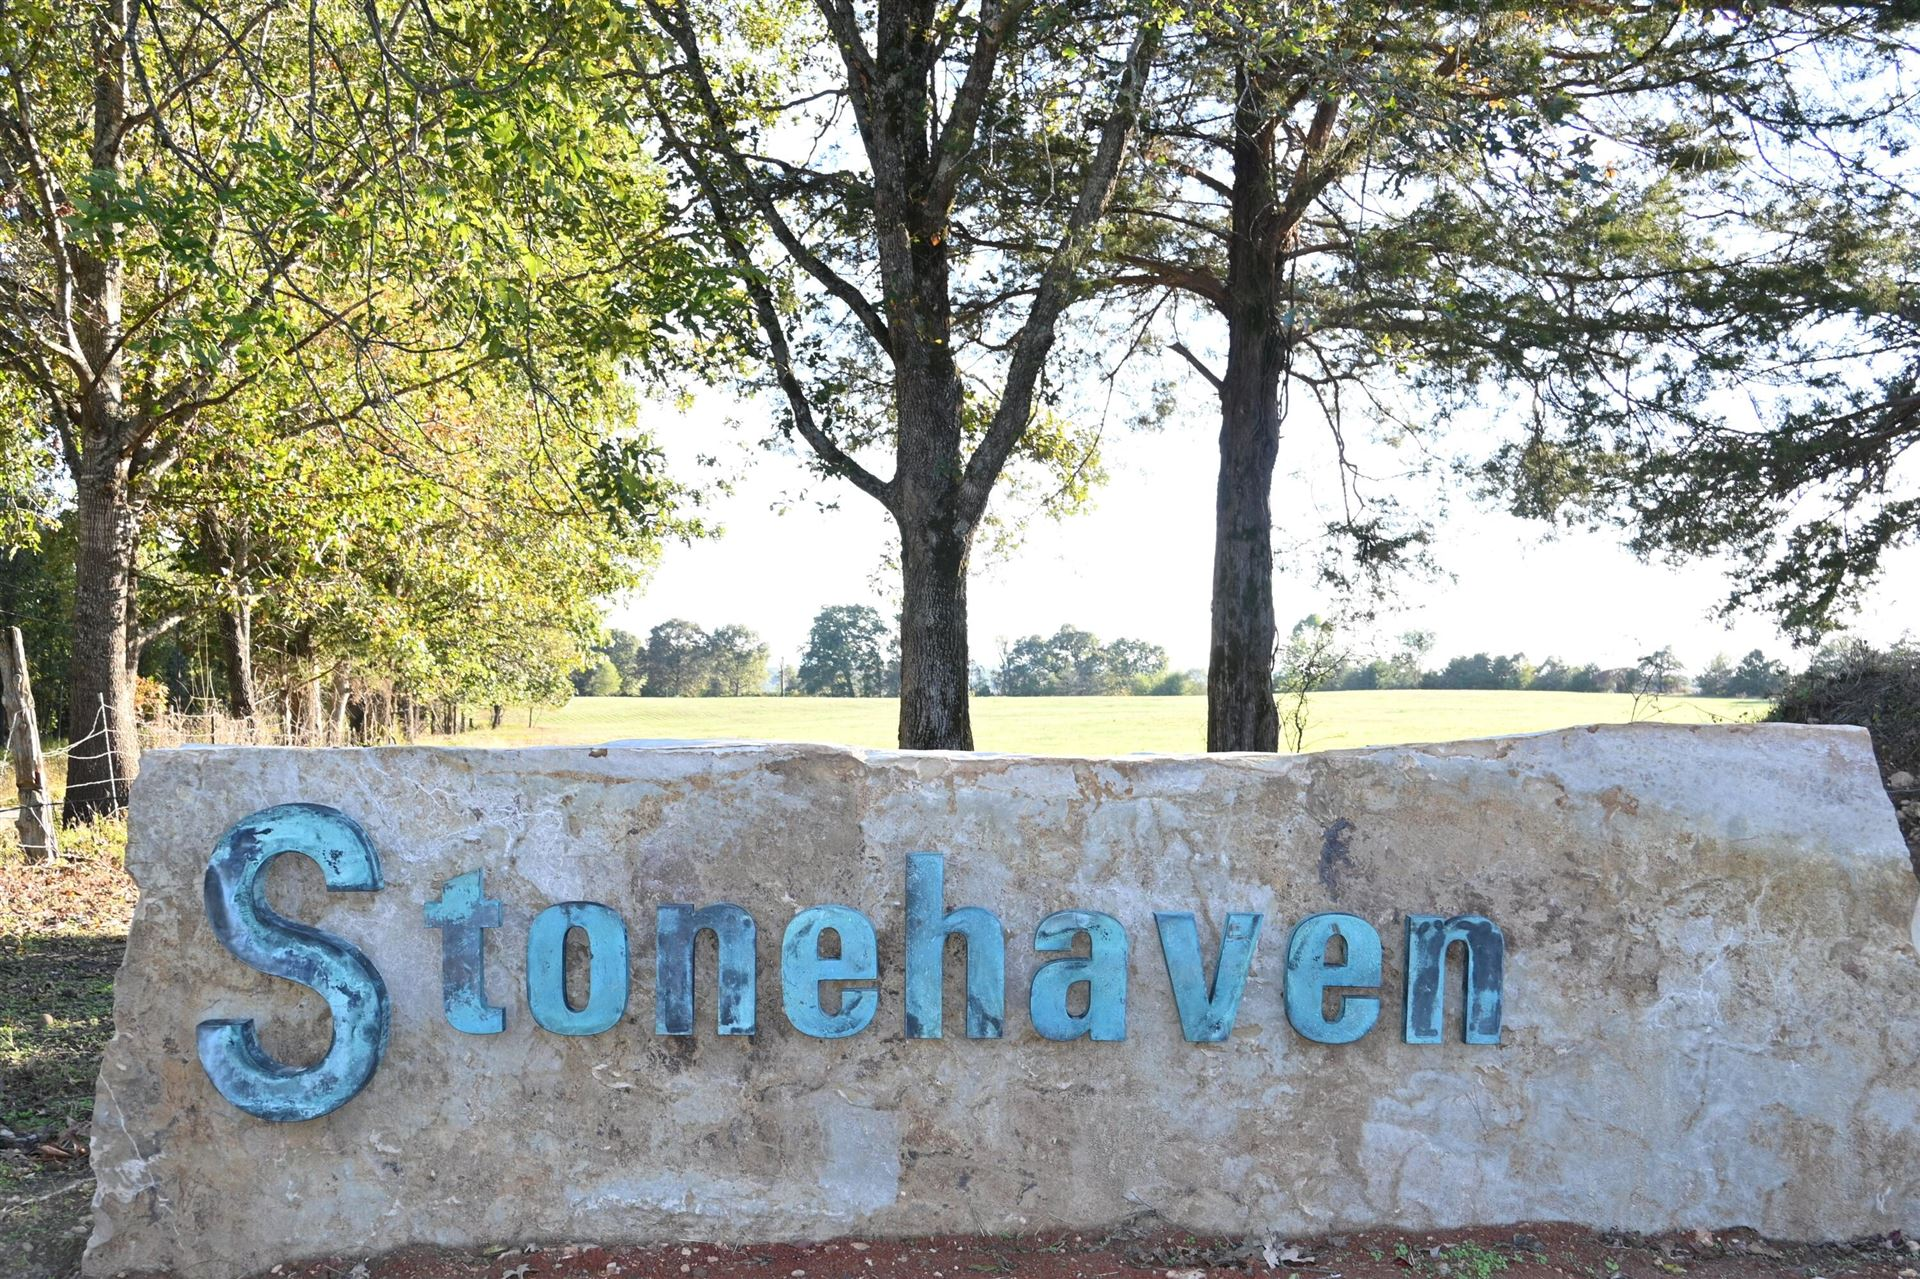 Photo of Lot 17 Stonehaven Way, Shell Knob, MO 65747 (MLS # 60203690)